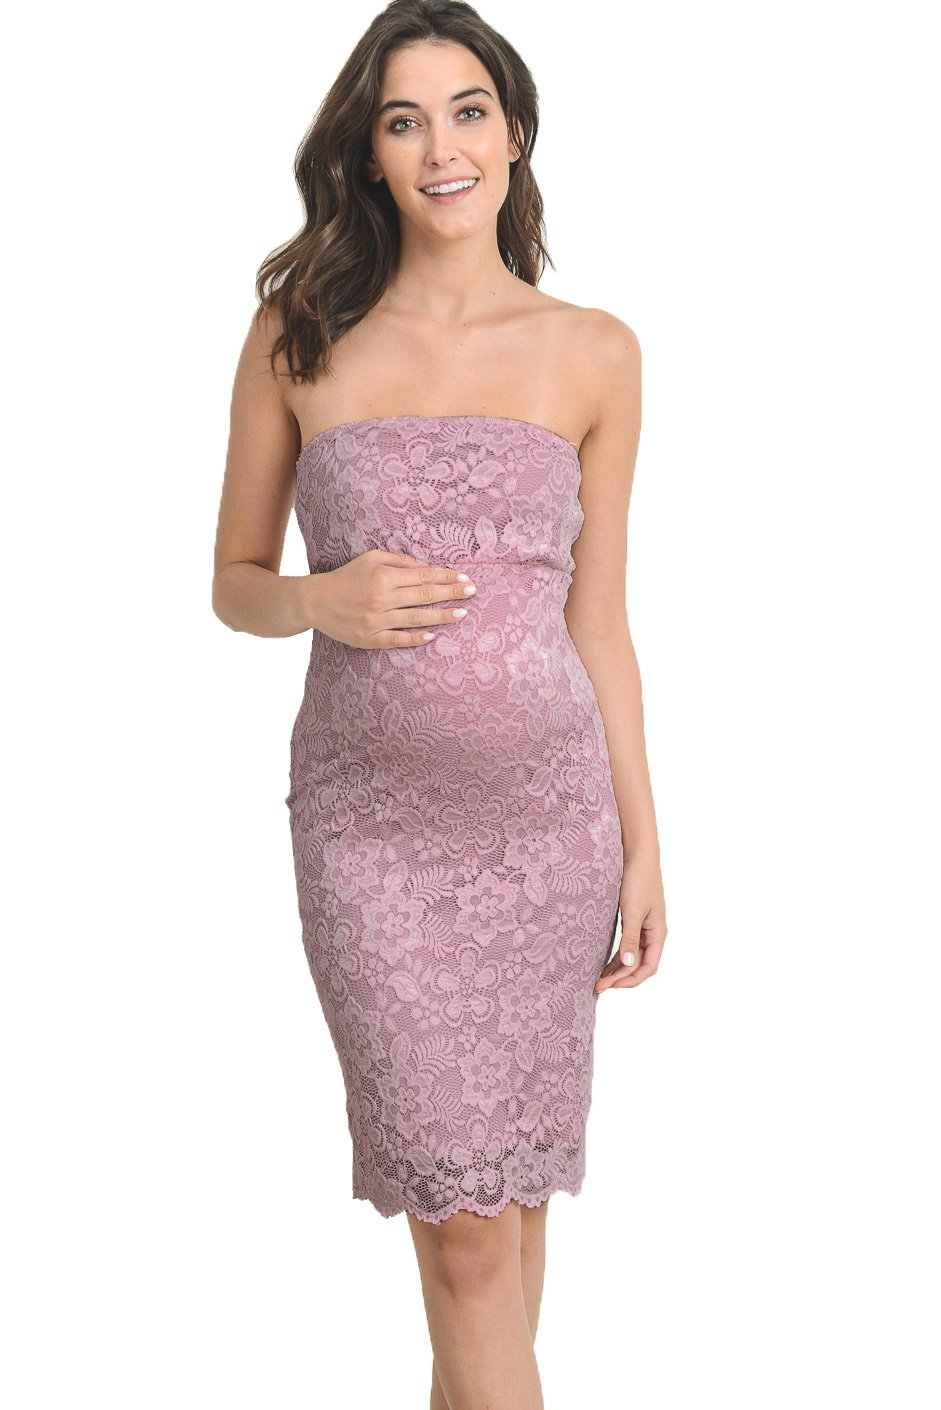 Hello MIZ Women's Floral Lace Strapless Bodycon Tube Maternity Dress(Mauve, X-Large